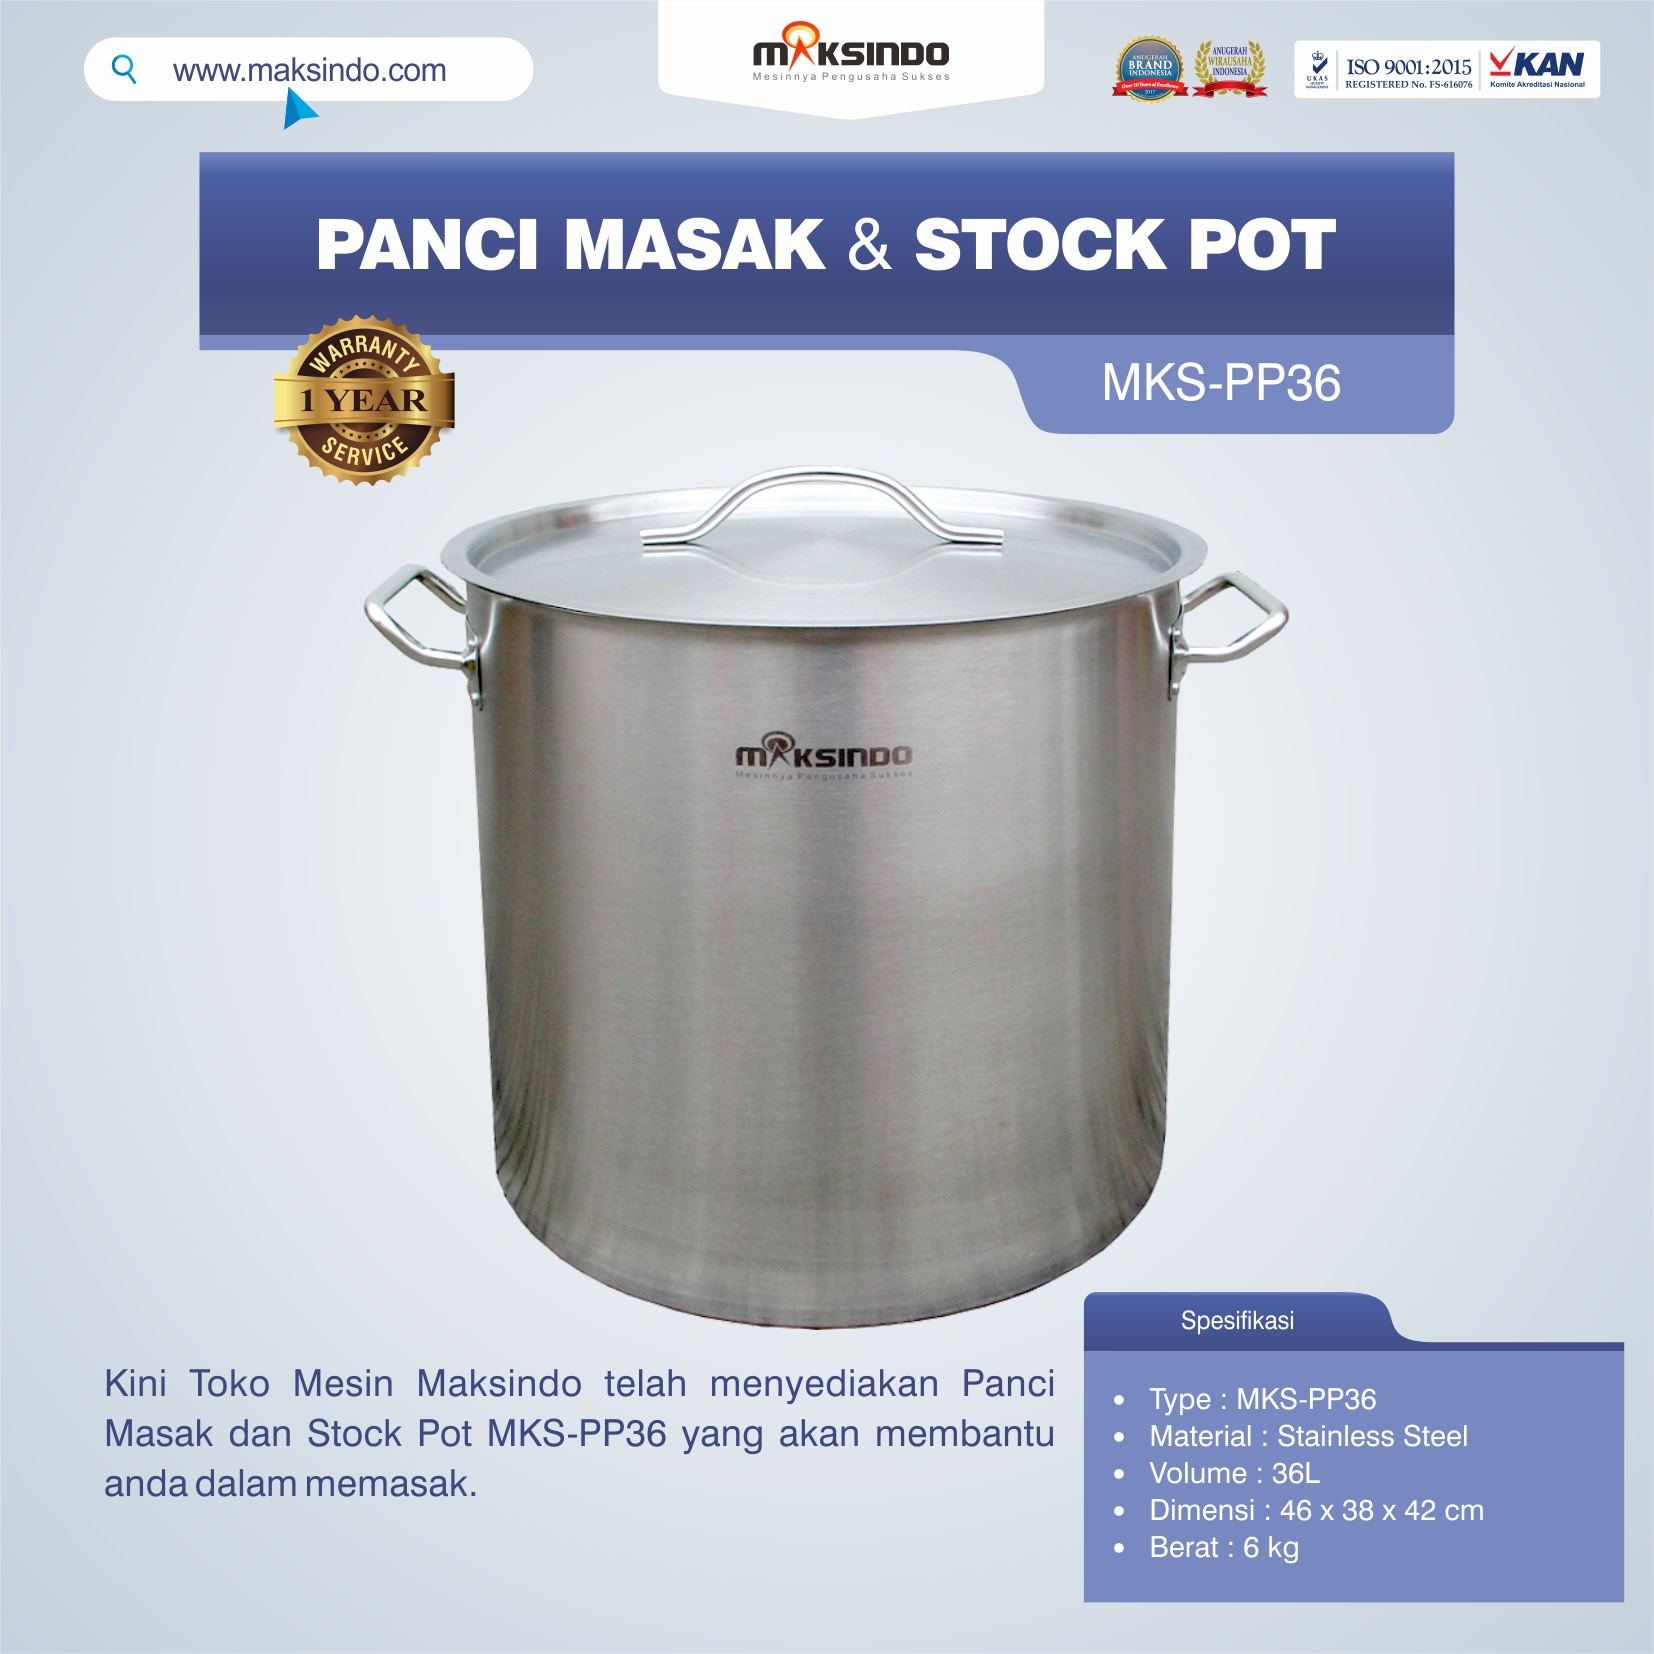 Panci Masak Dan Stock Pot MKS-PP36